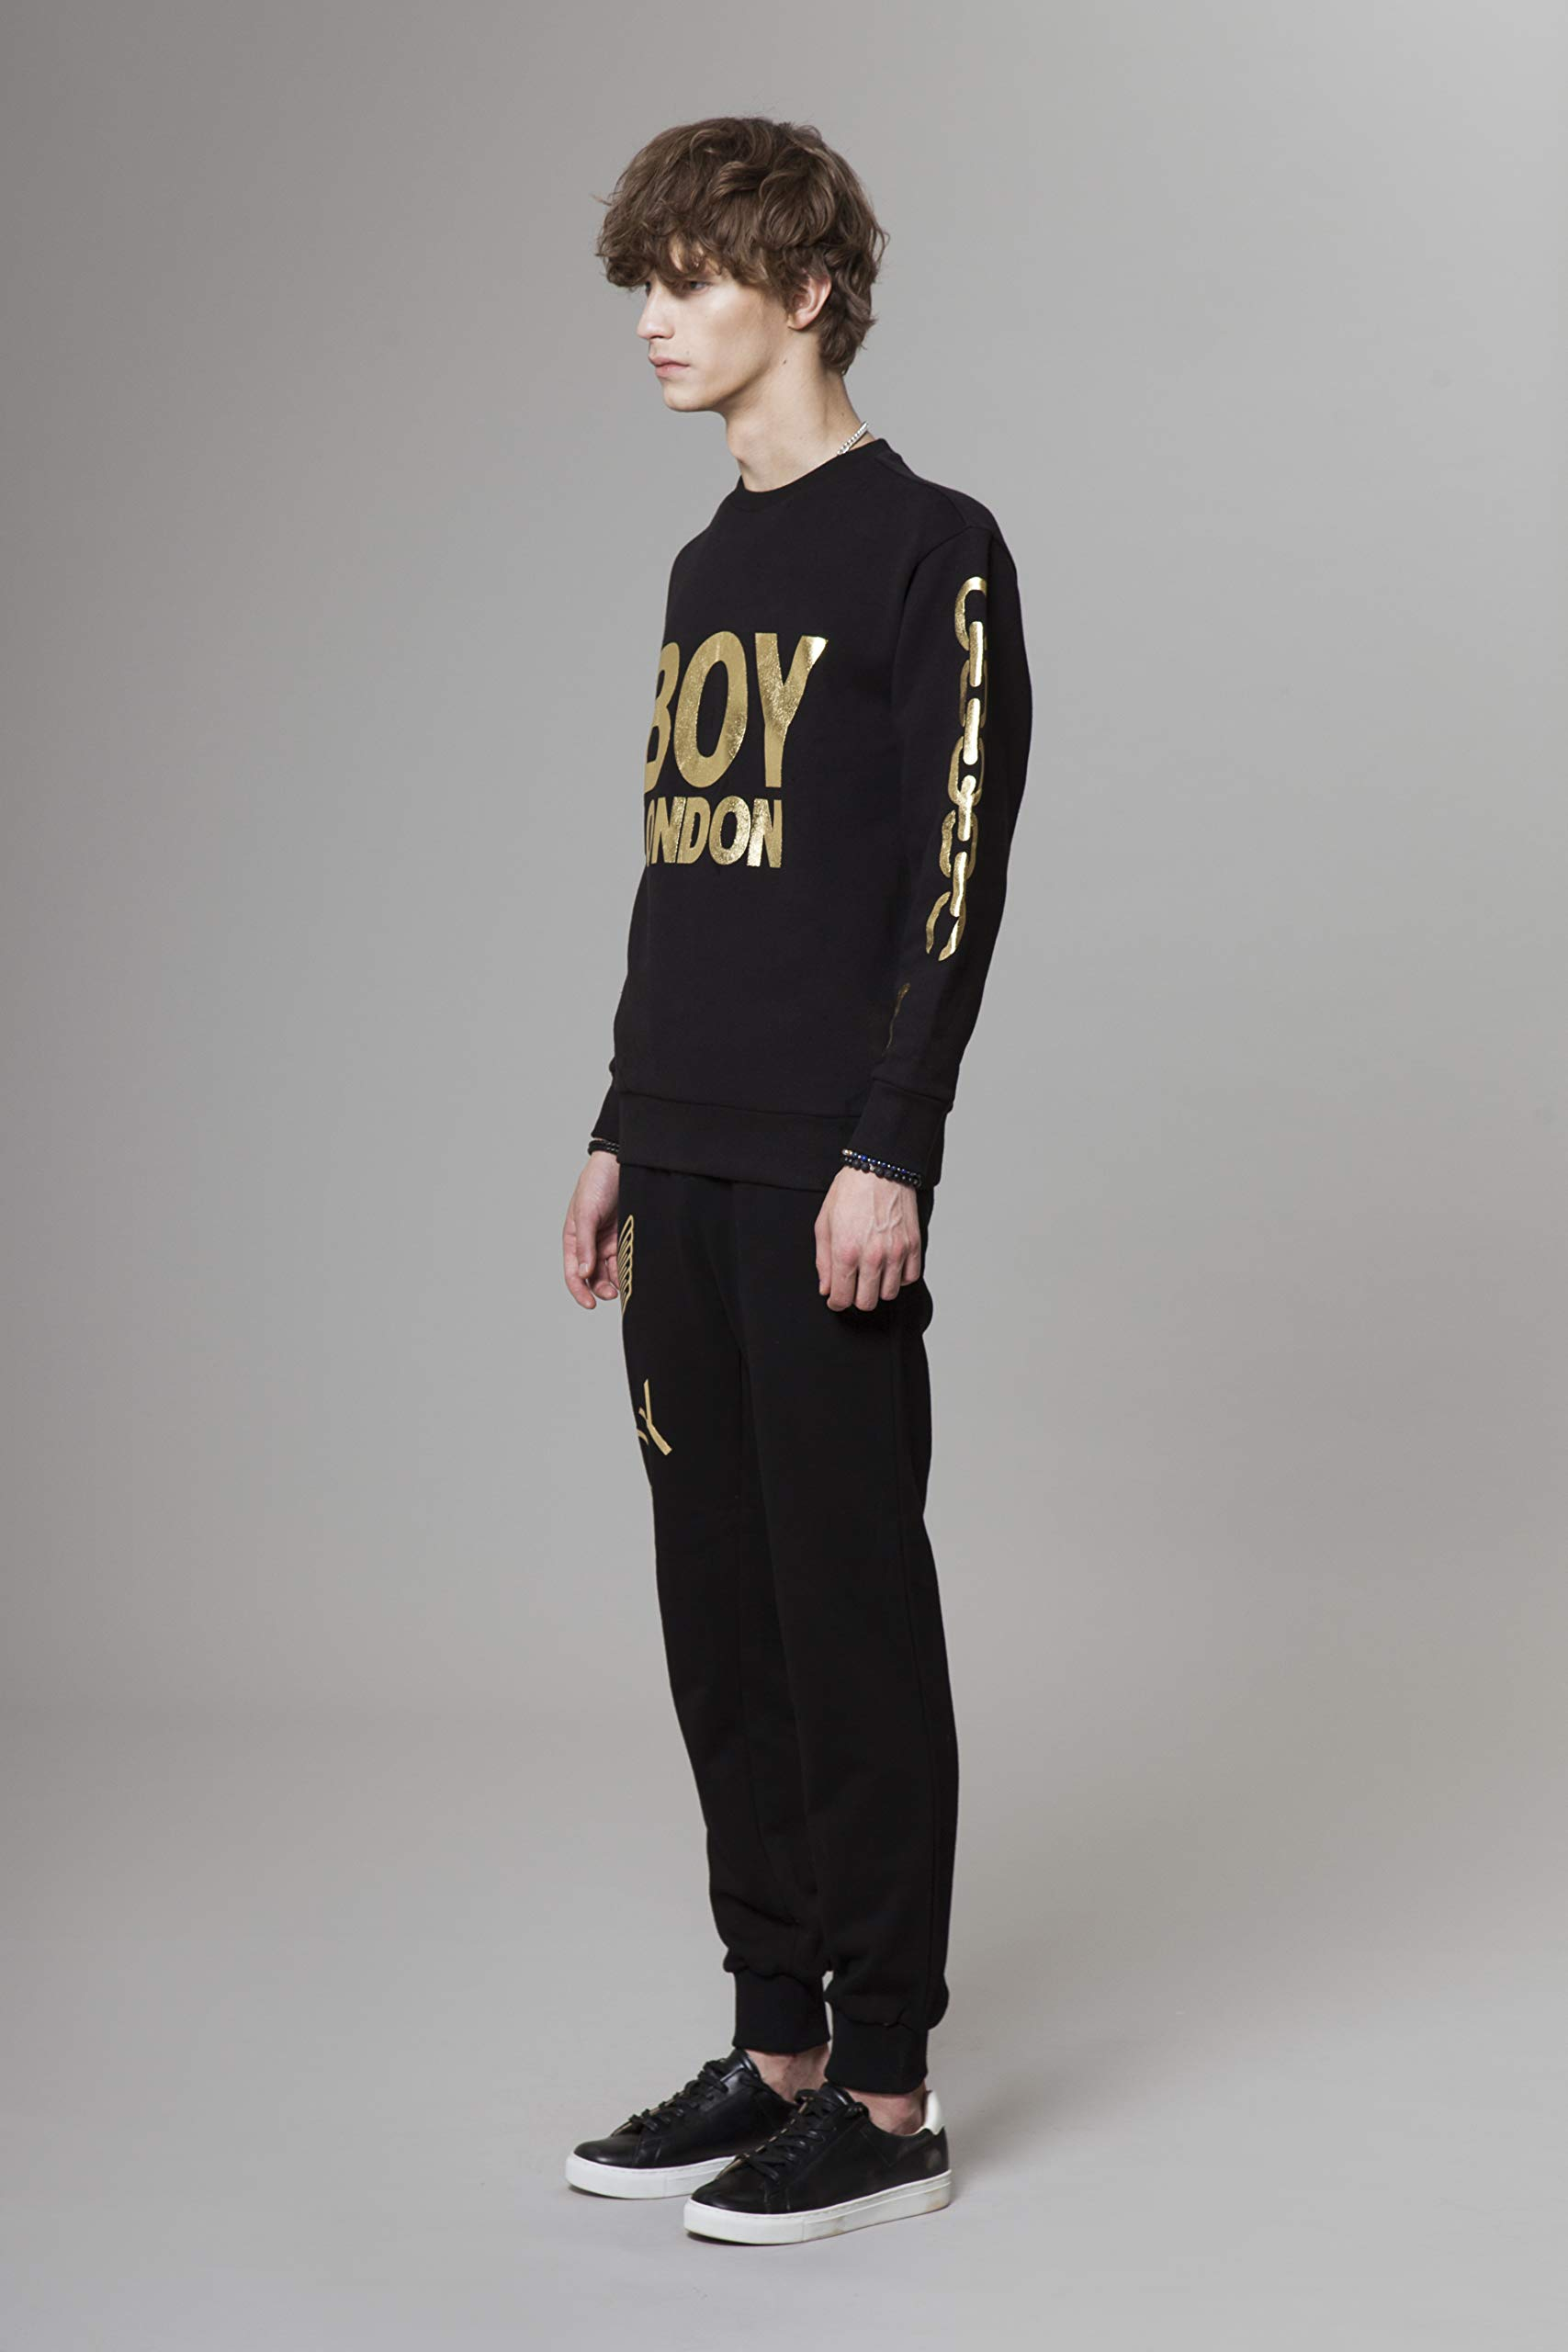 BOY LONDON Silver Chain Printed on Sleeves Sweatshirt-Black-Gold, Medium - BG4TL021 by BOY LONDON (Image #2)